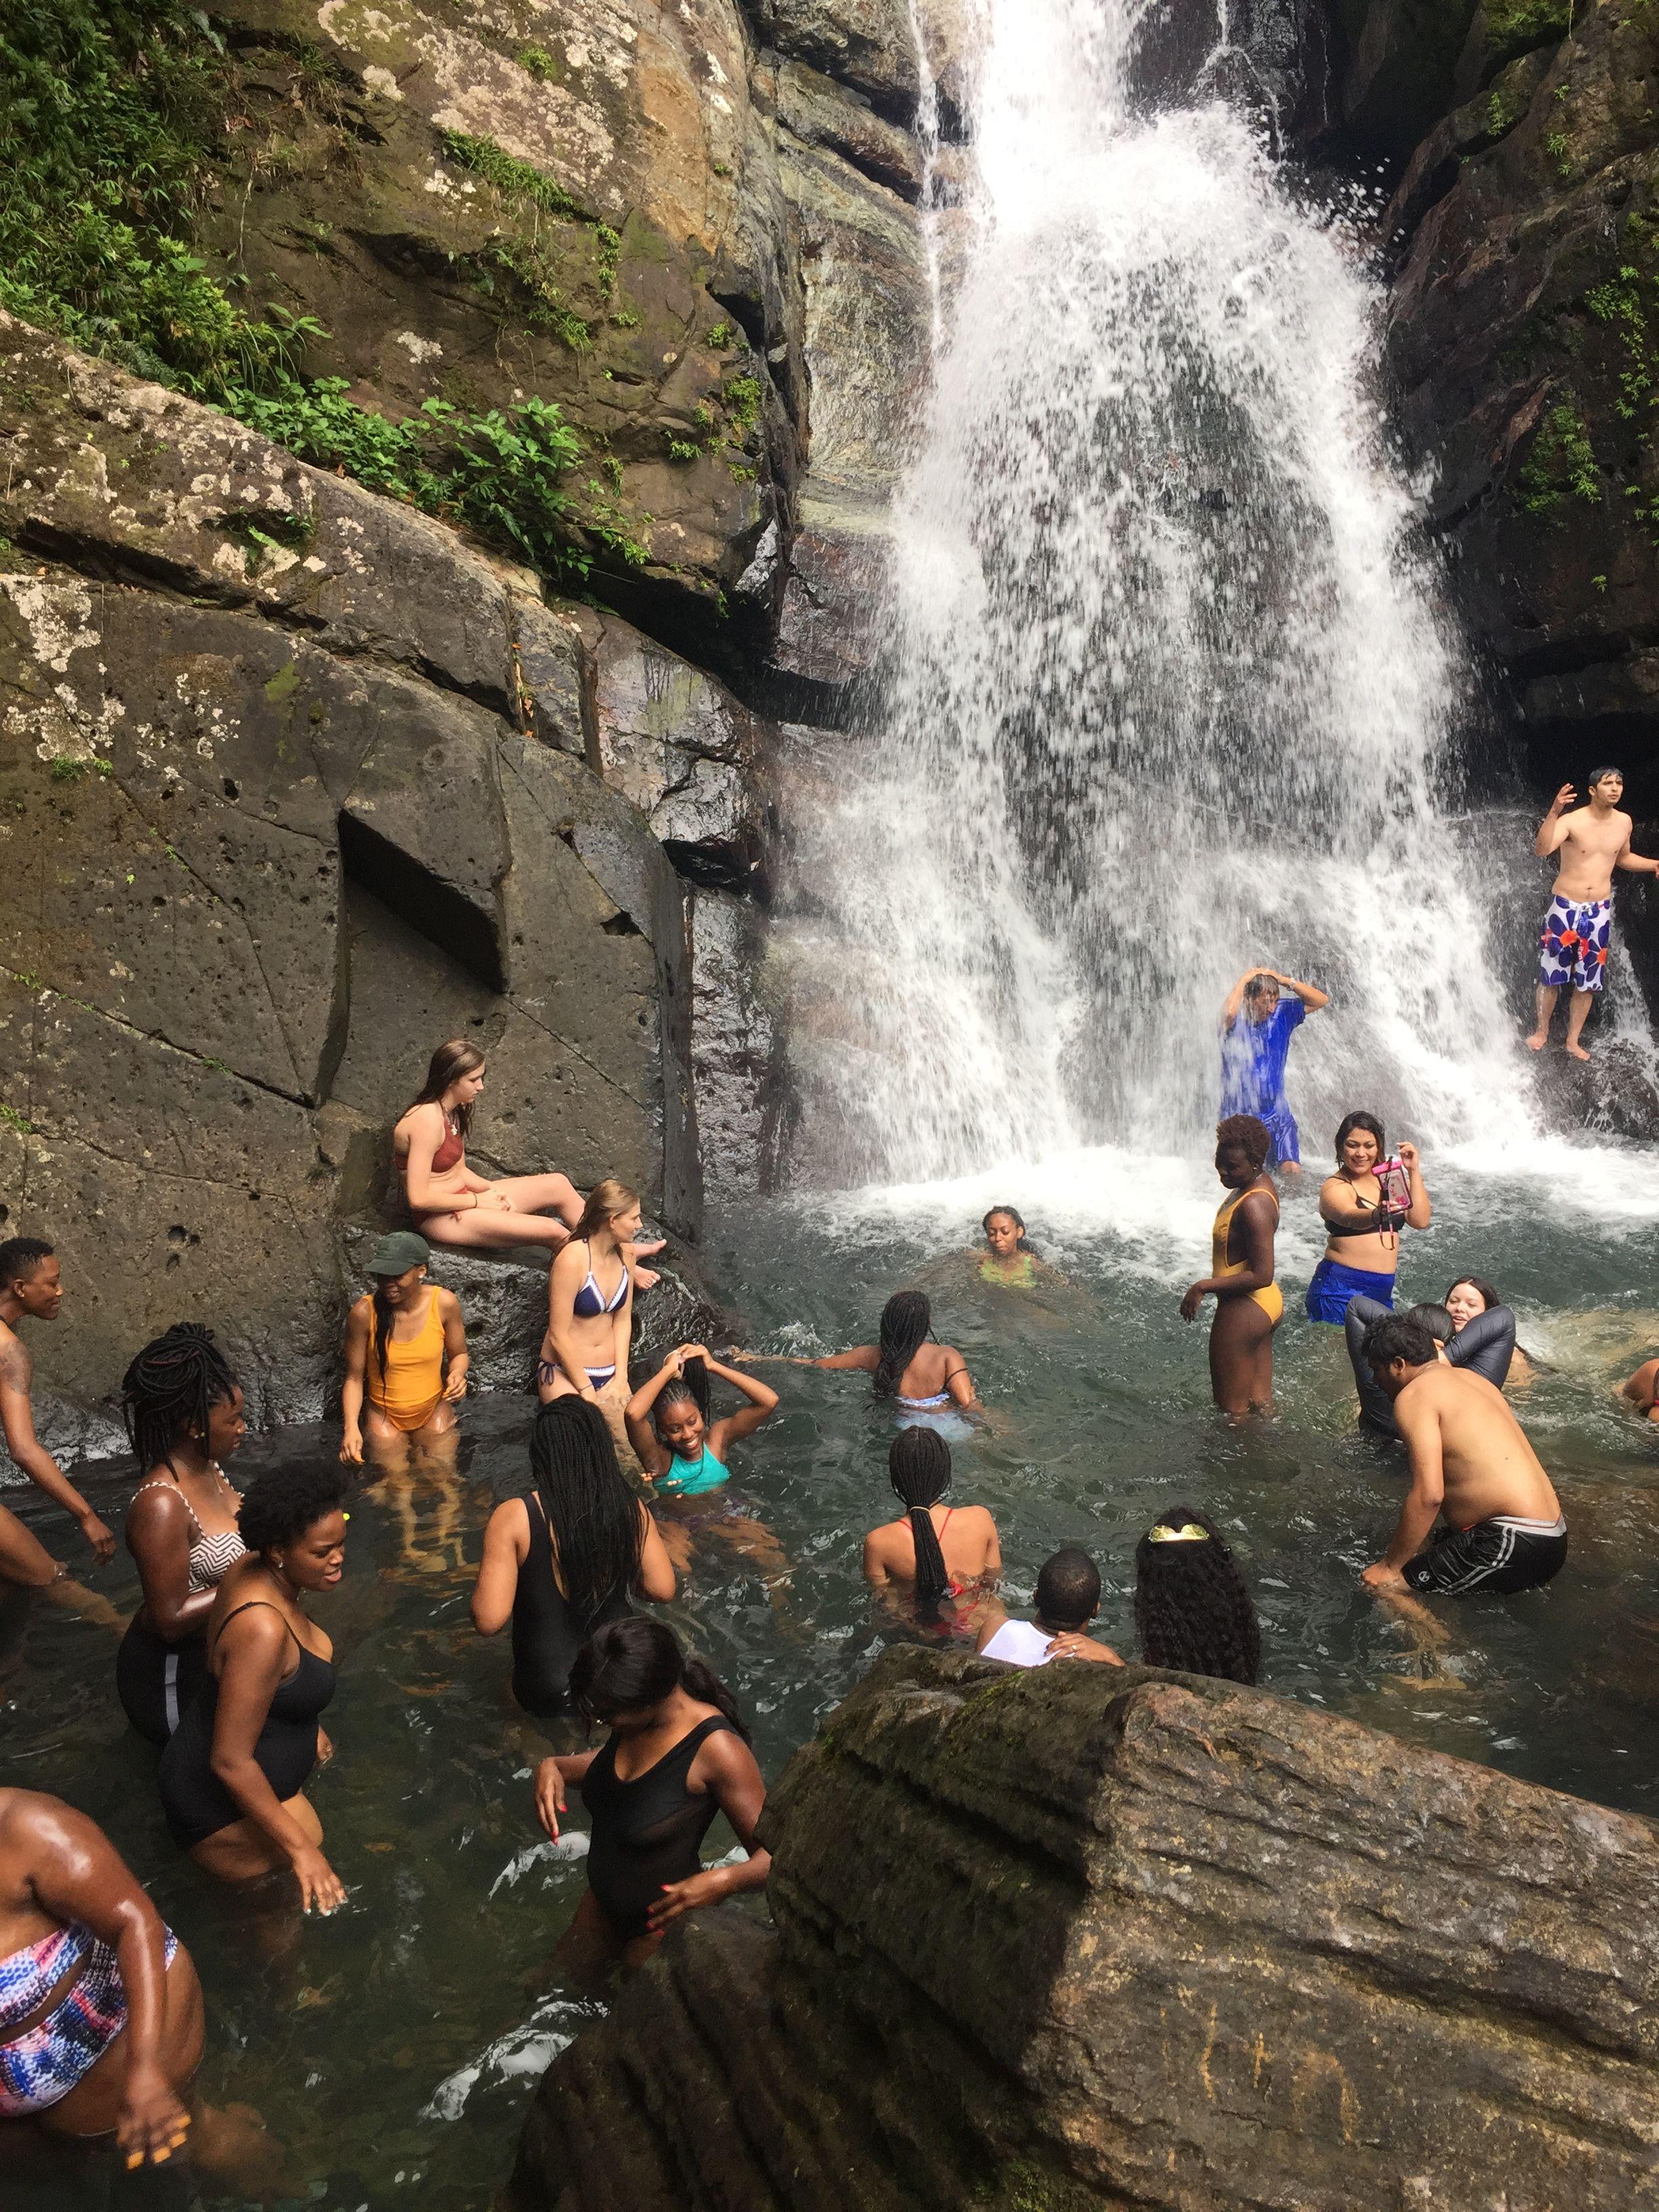 La Mina Falls Puerto Rico Swim Spot #Tour #Puertorico #Elyunquerainforest